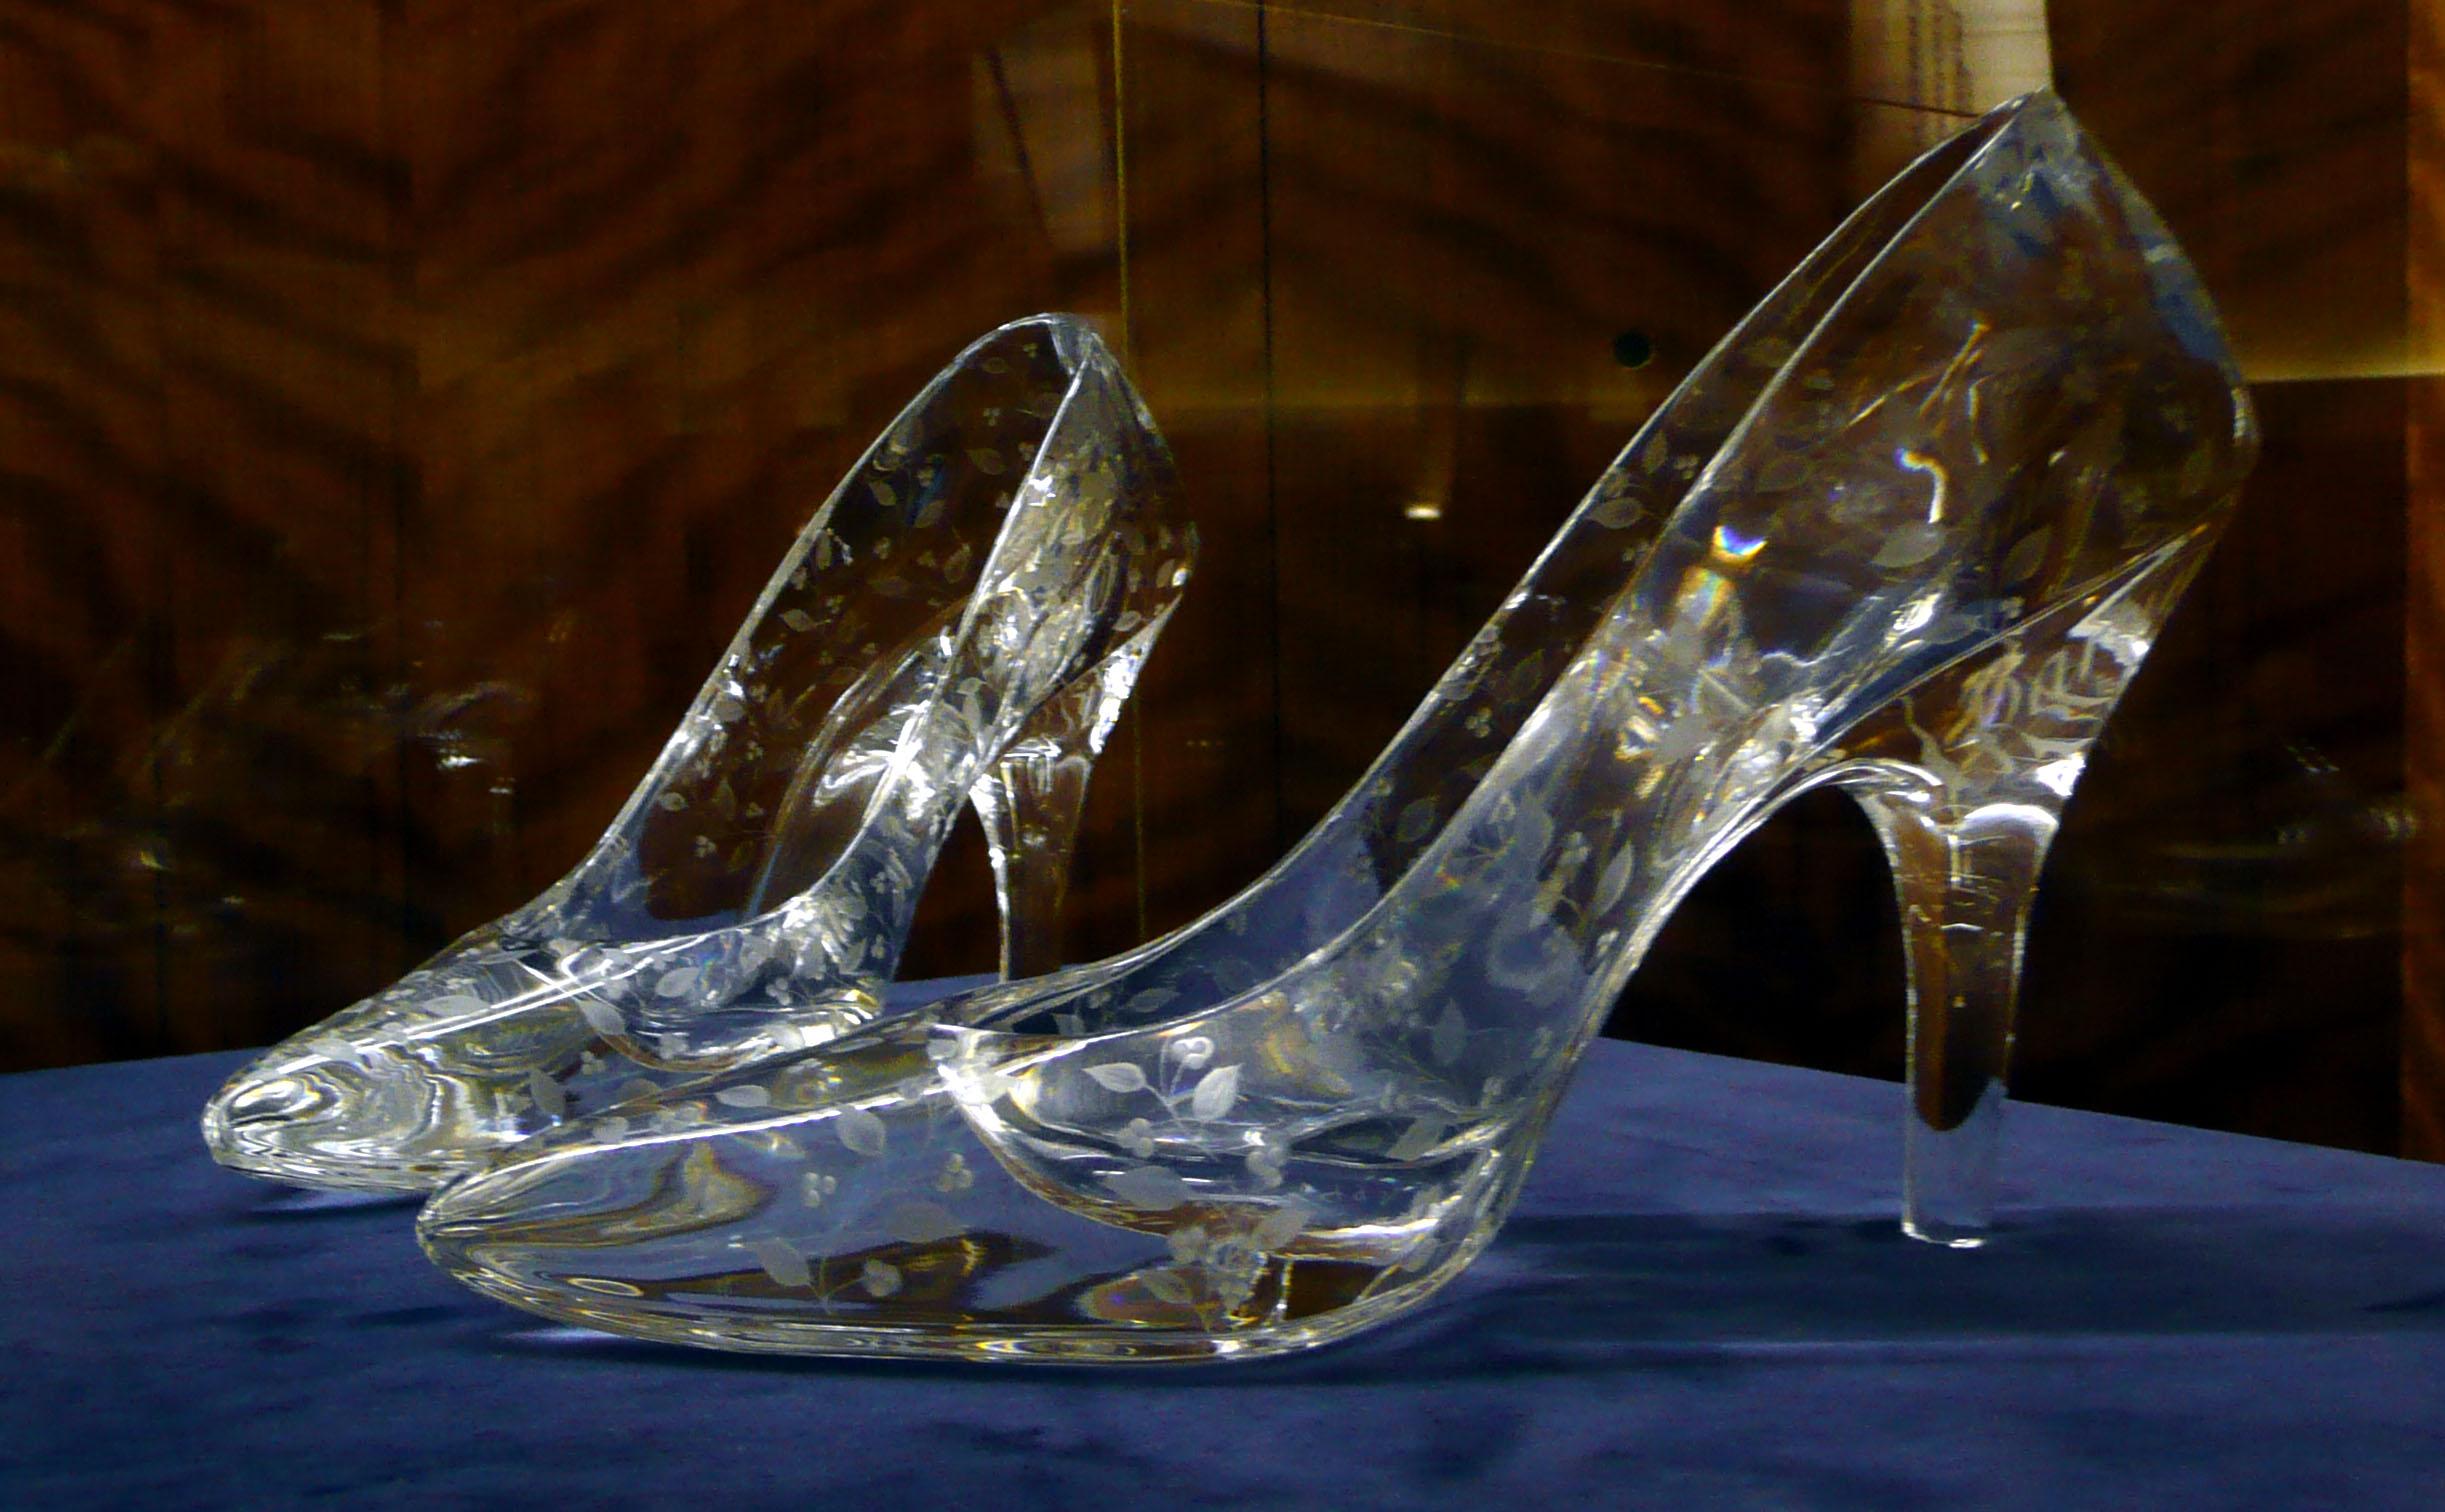 glass slipers